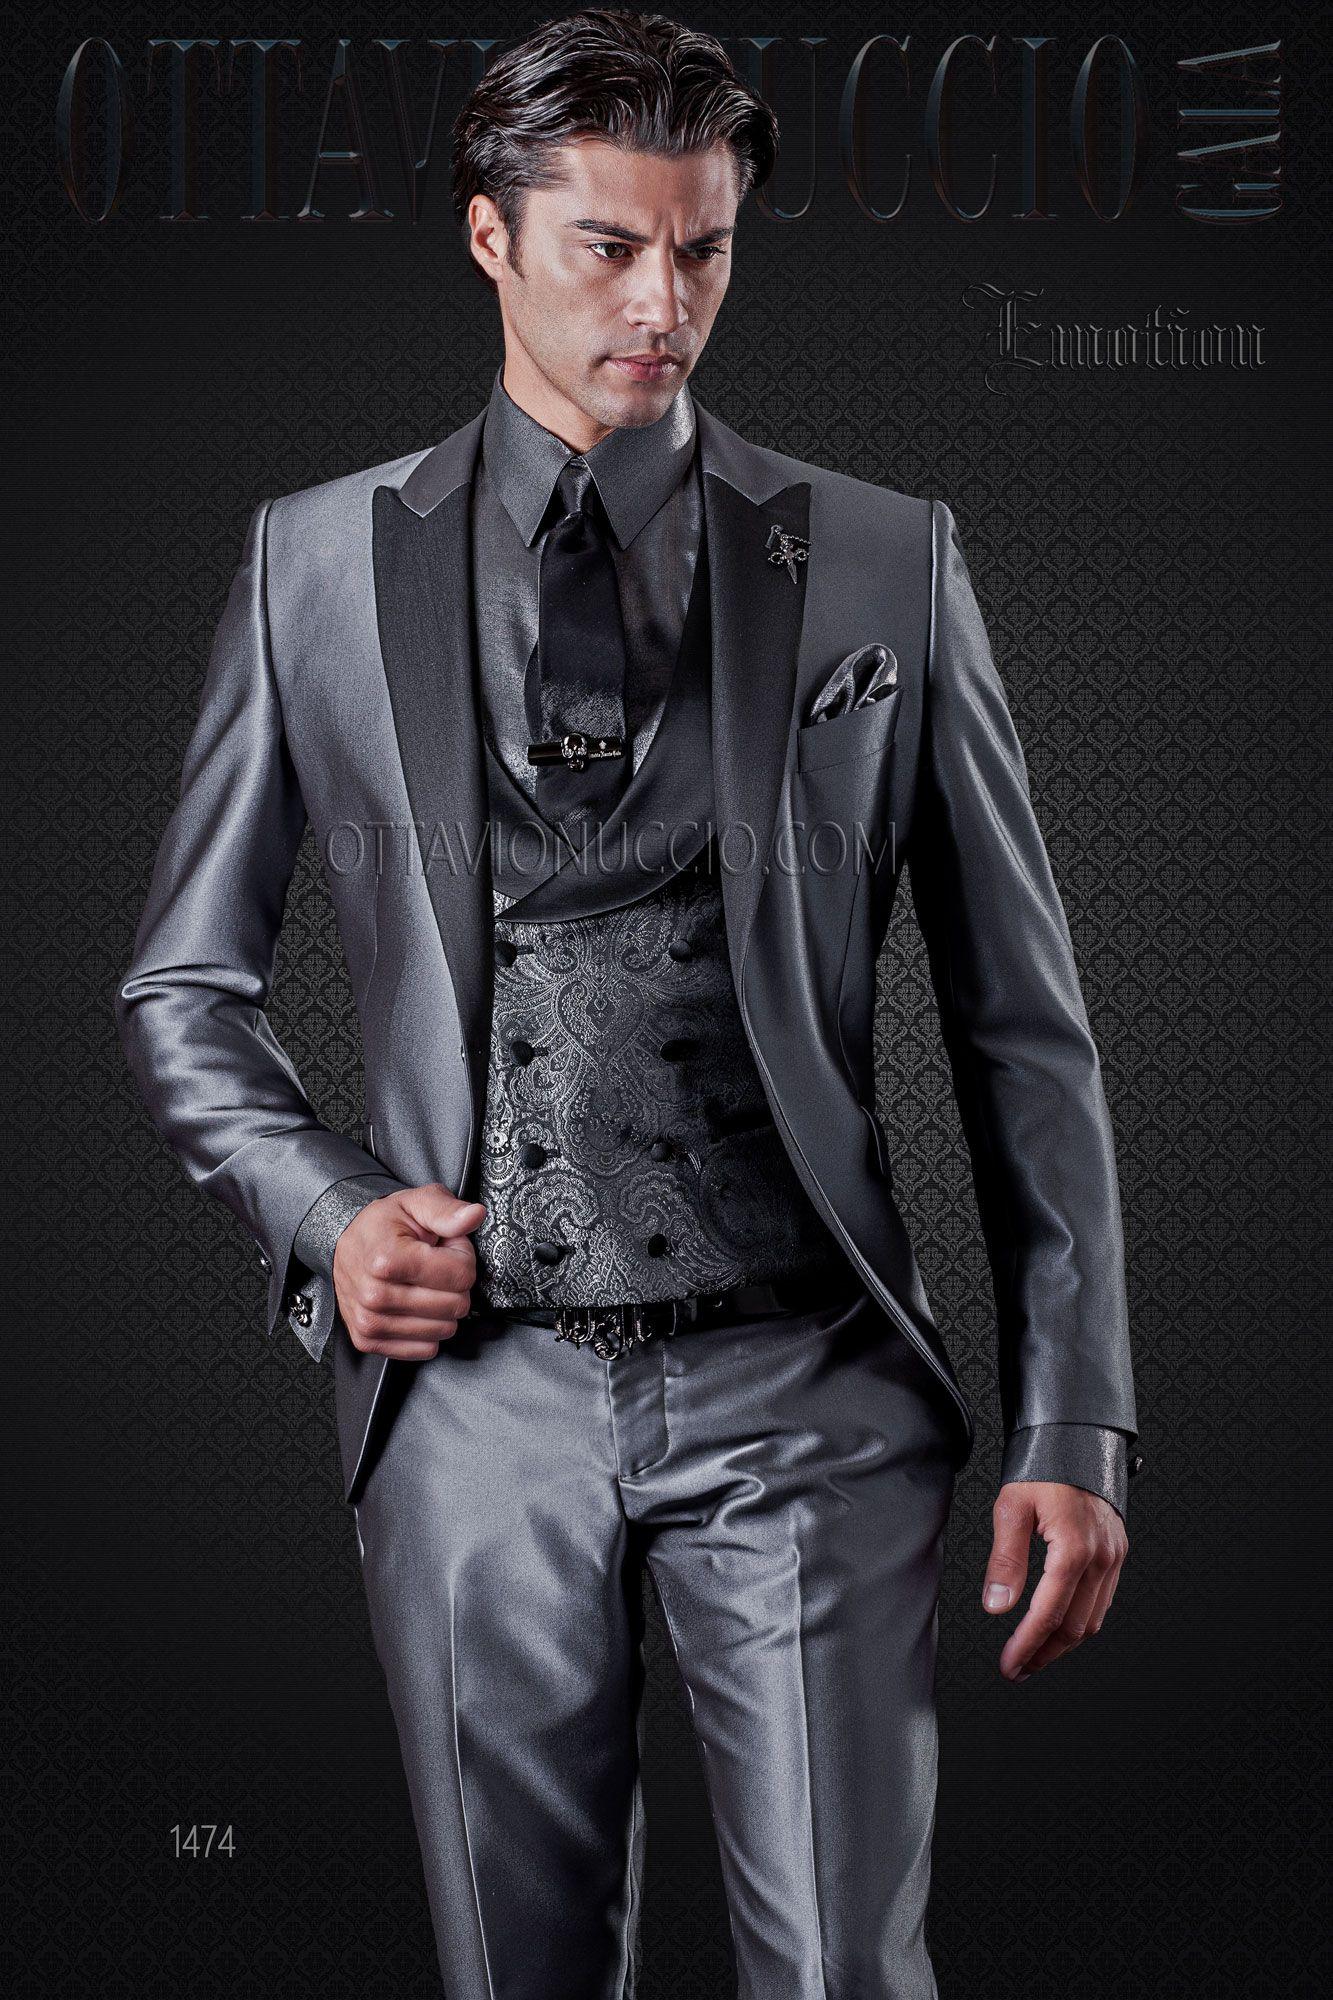 Grey men tuxedo with jacquard vest